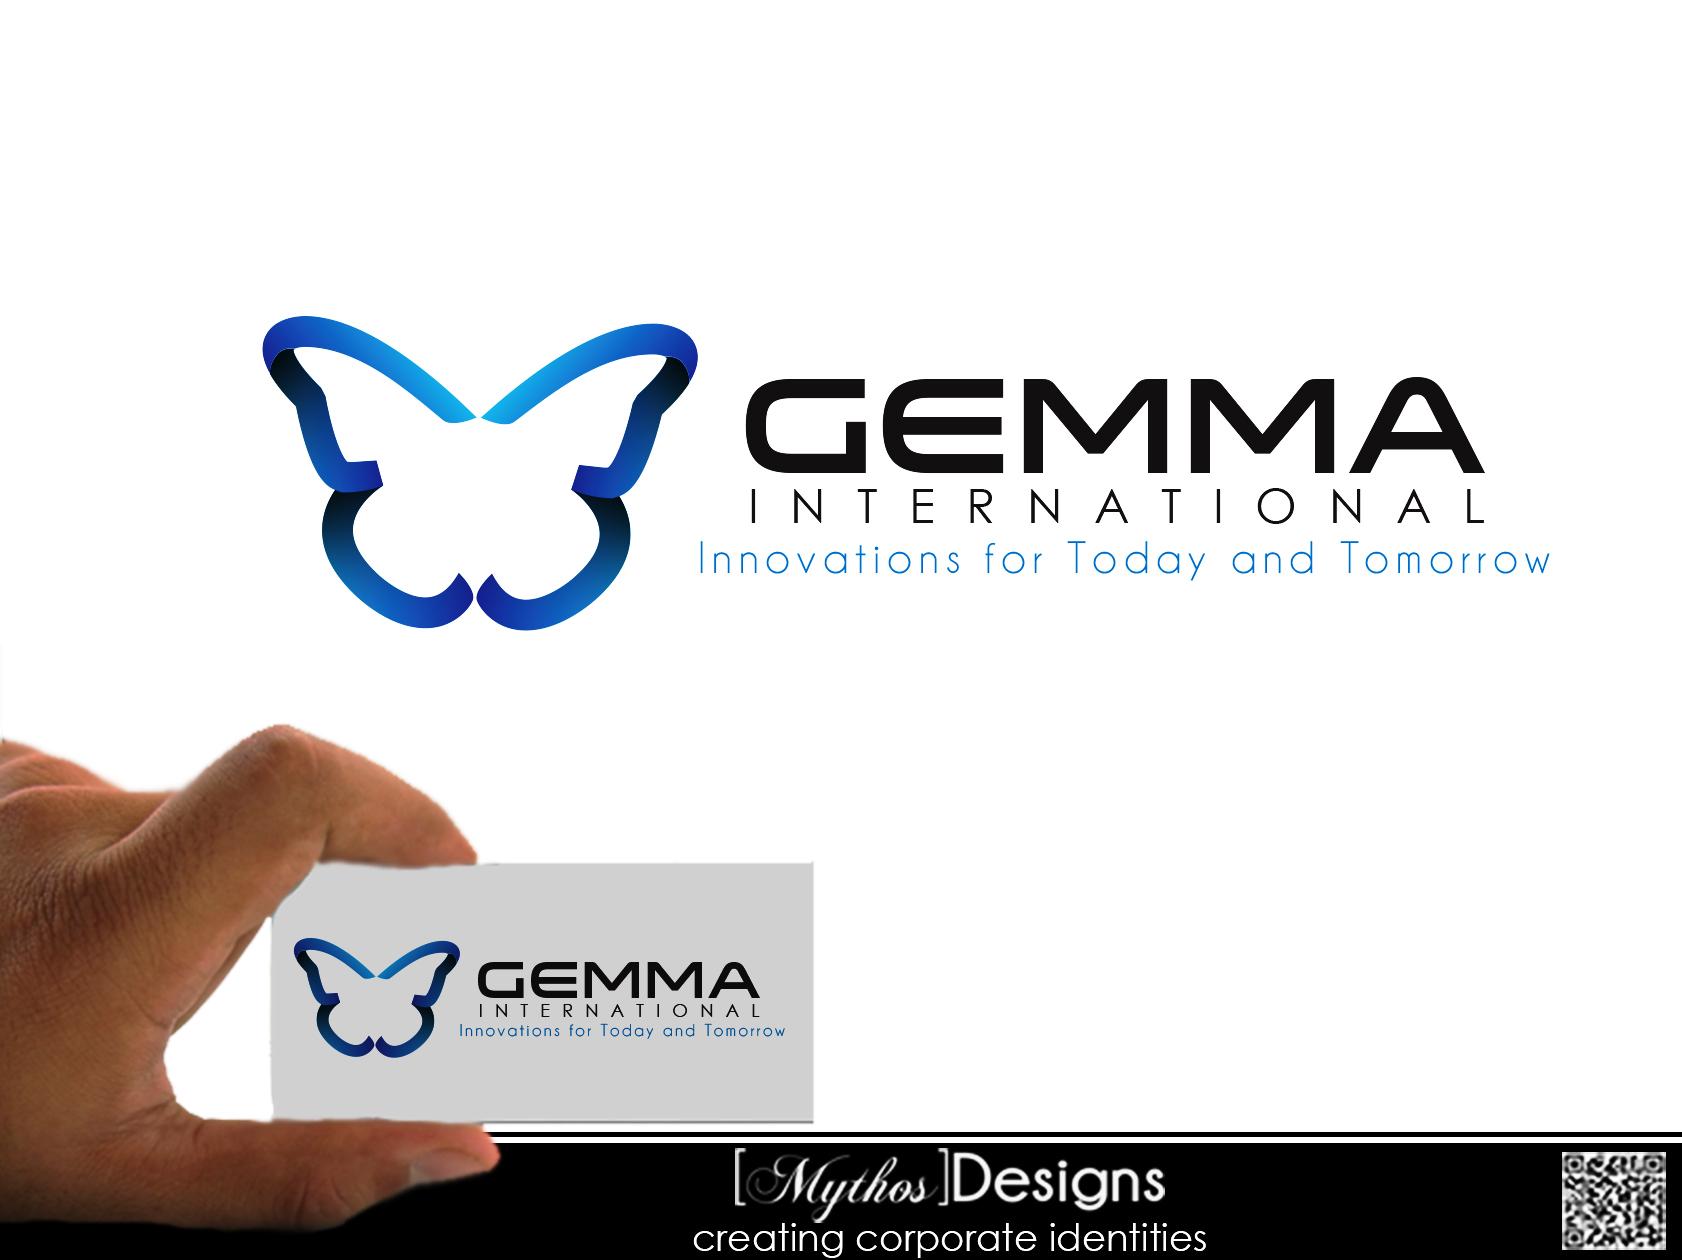 Logo Design by Mythos Designs - Entry No. 51 in the Logo Design Contest Artistic Logo Design for Gemma International.